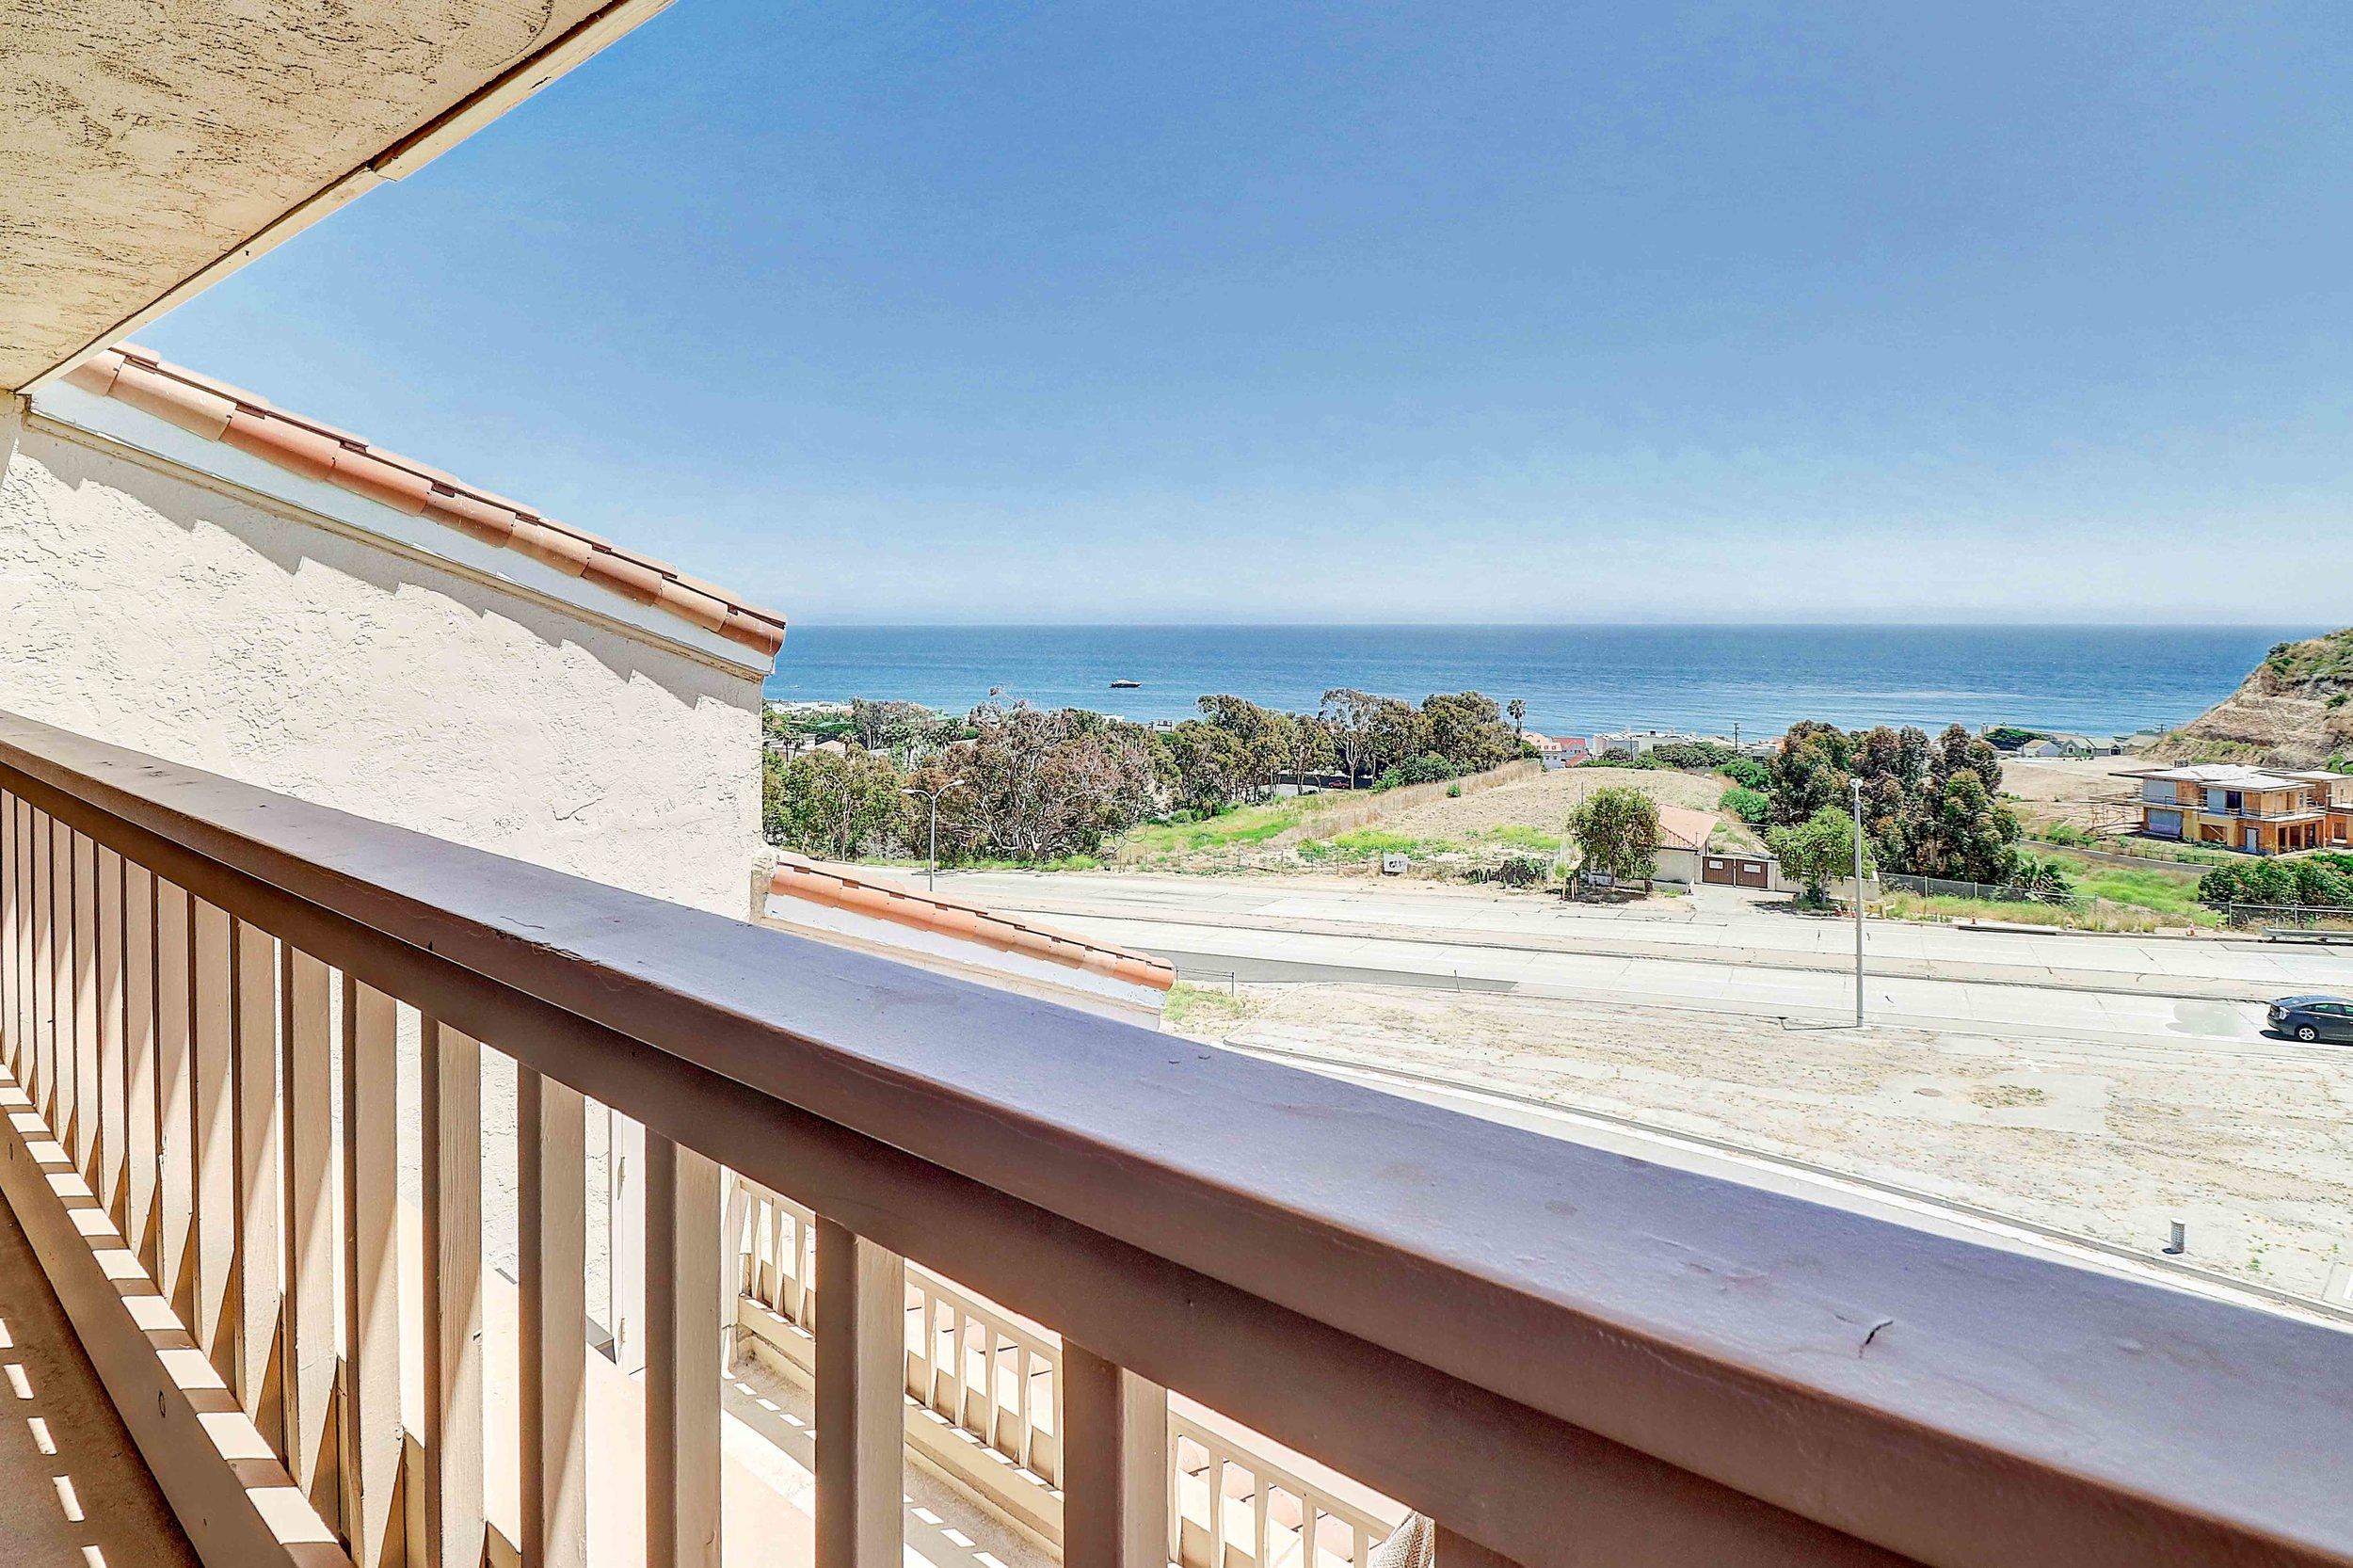 23916 De Ville Way # C Malibu, CA 90265 - View More